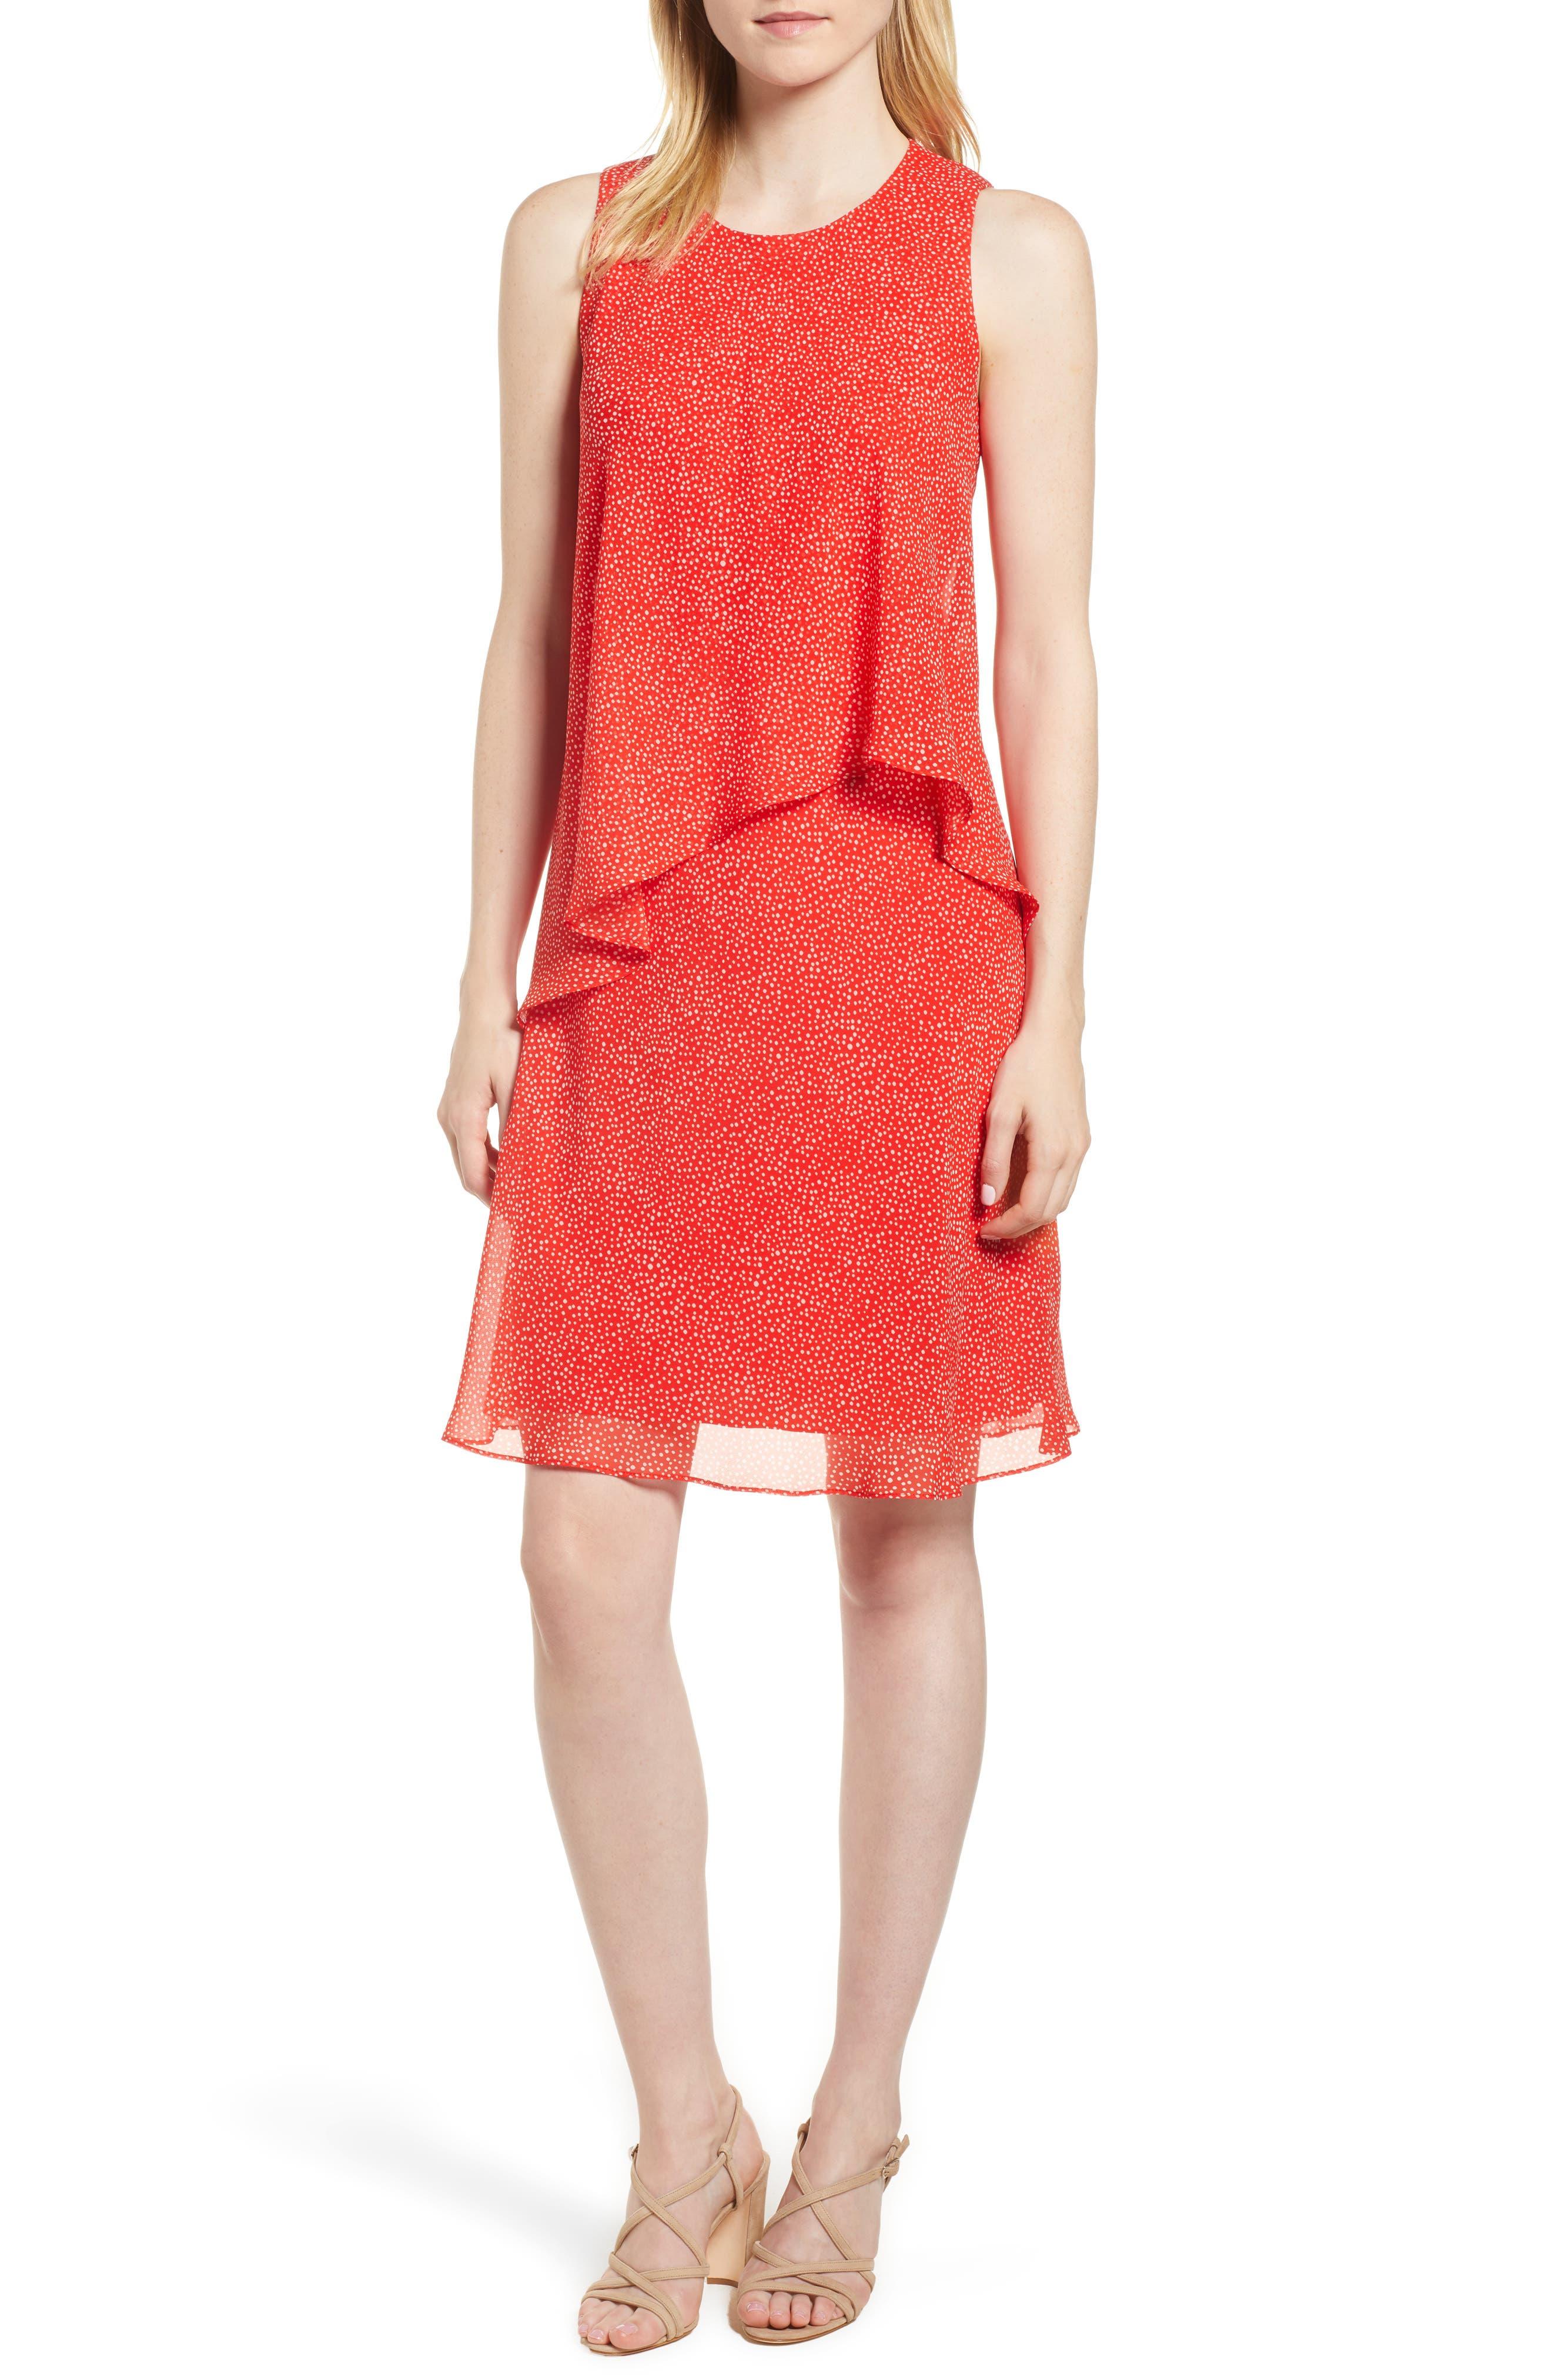 Chiffon Overlay A-Line Dress,                         Main,                         color, Tomato/ White